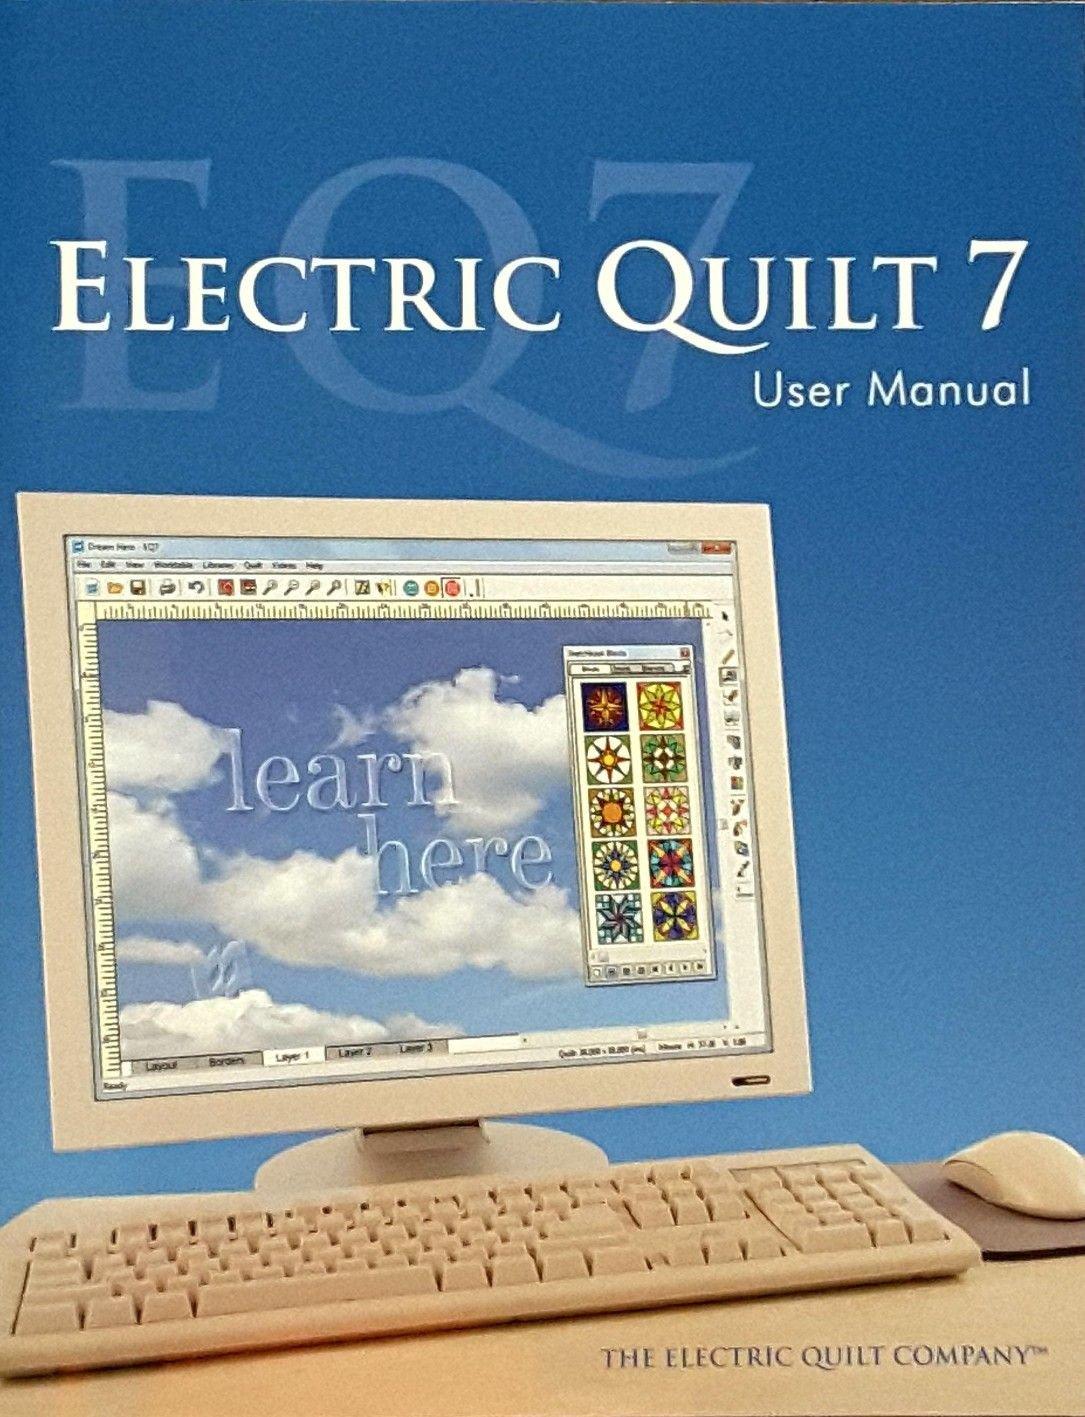 EQ7 User Manual - Windows